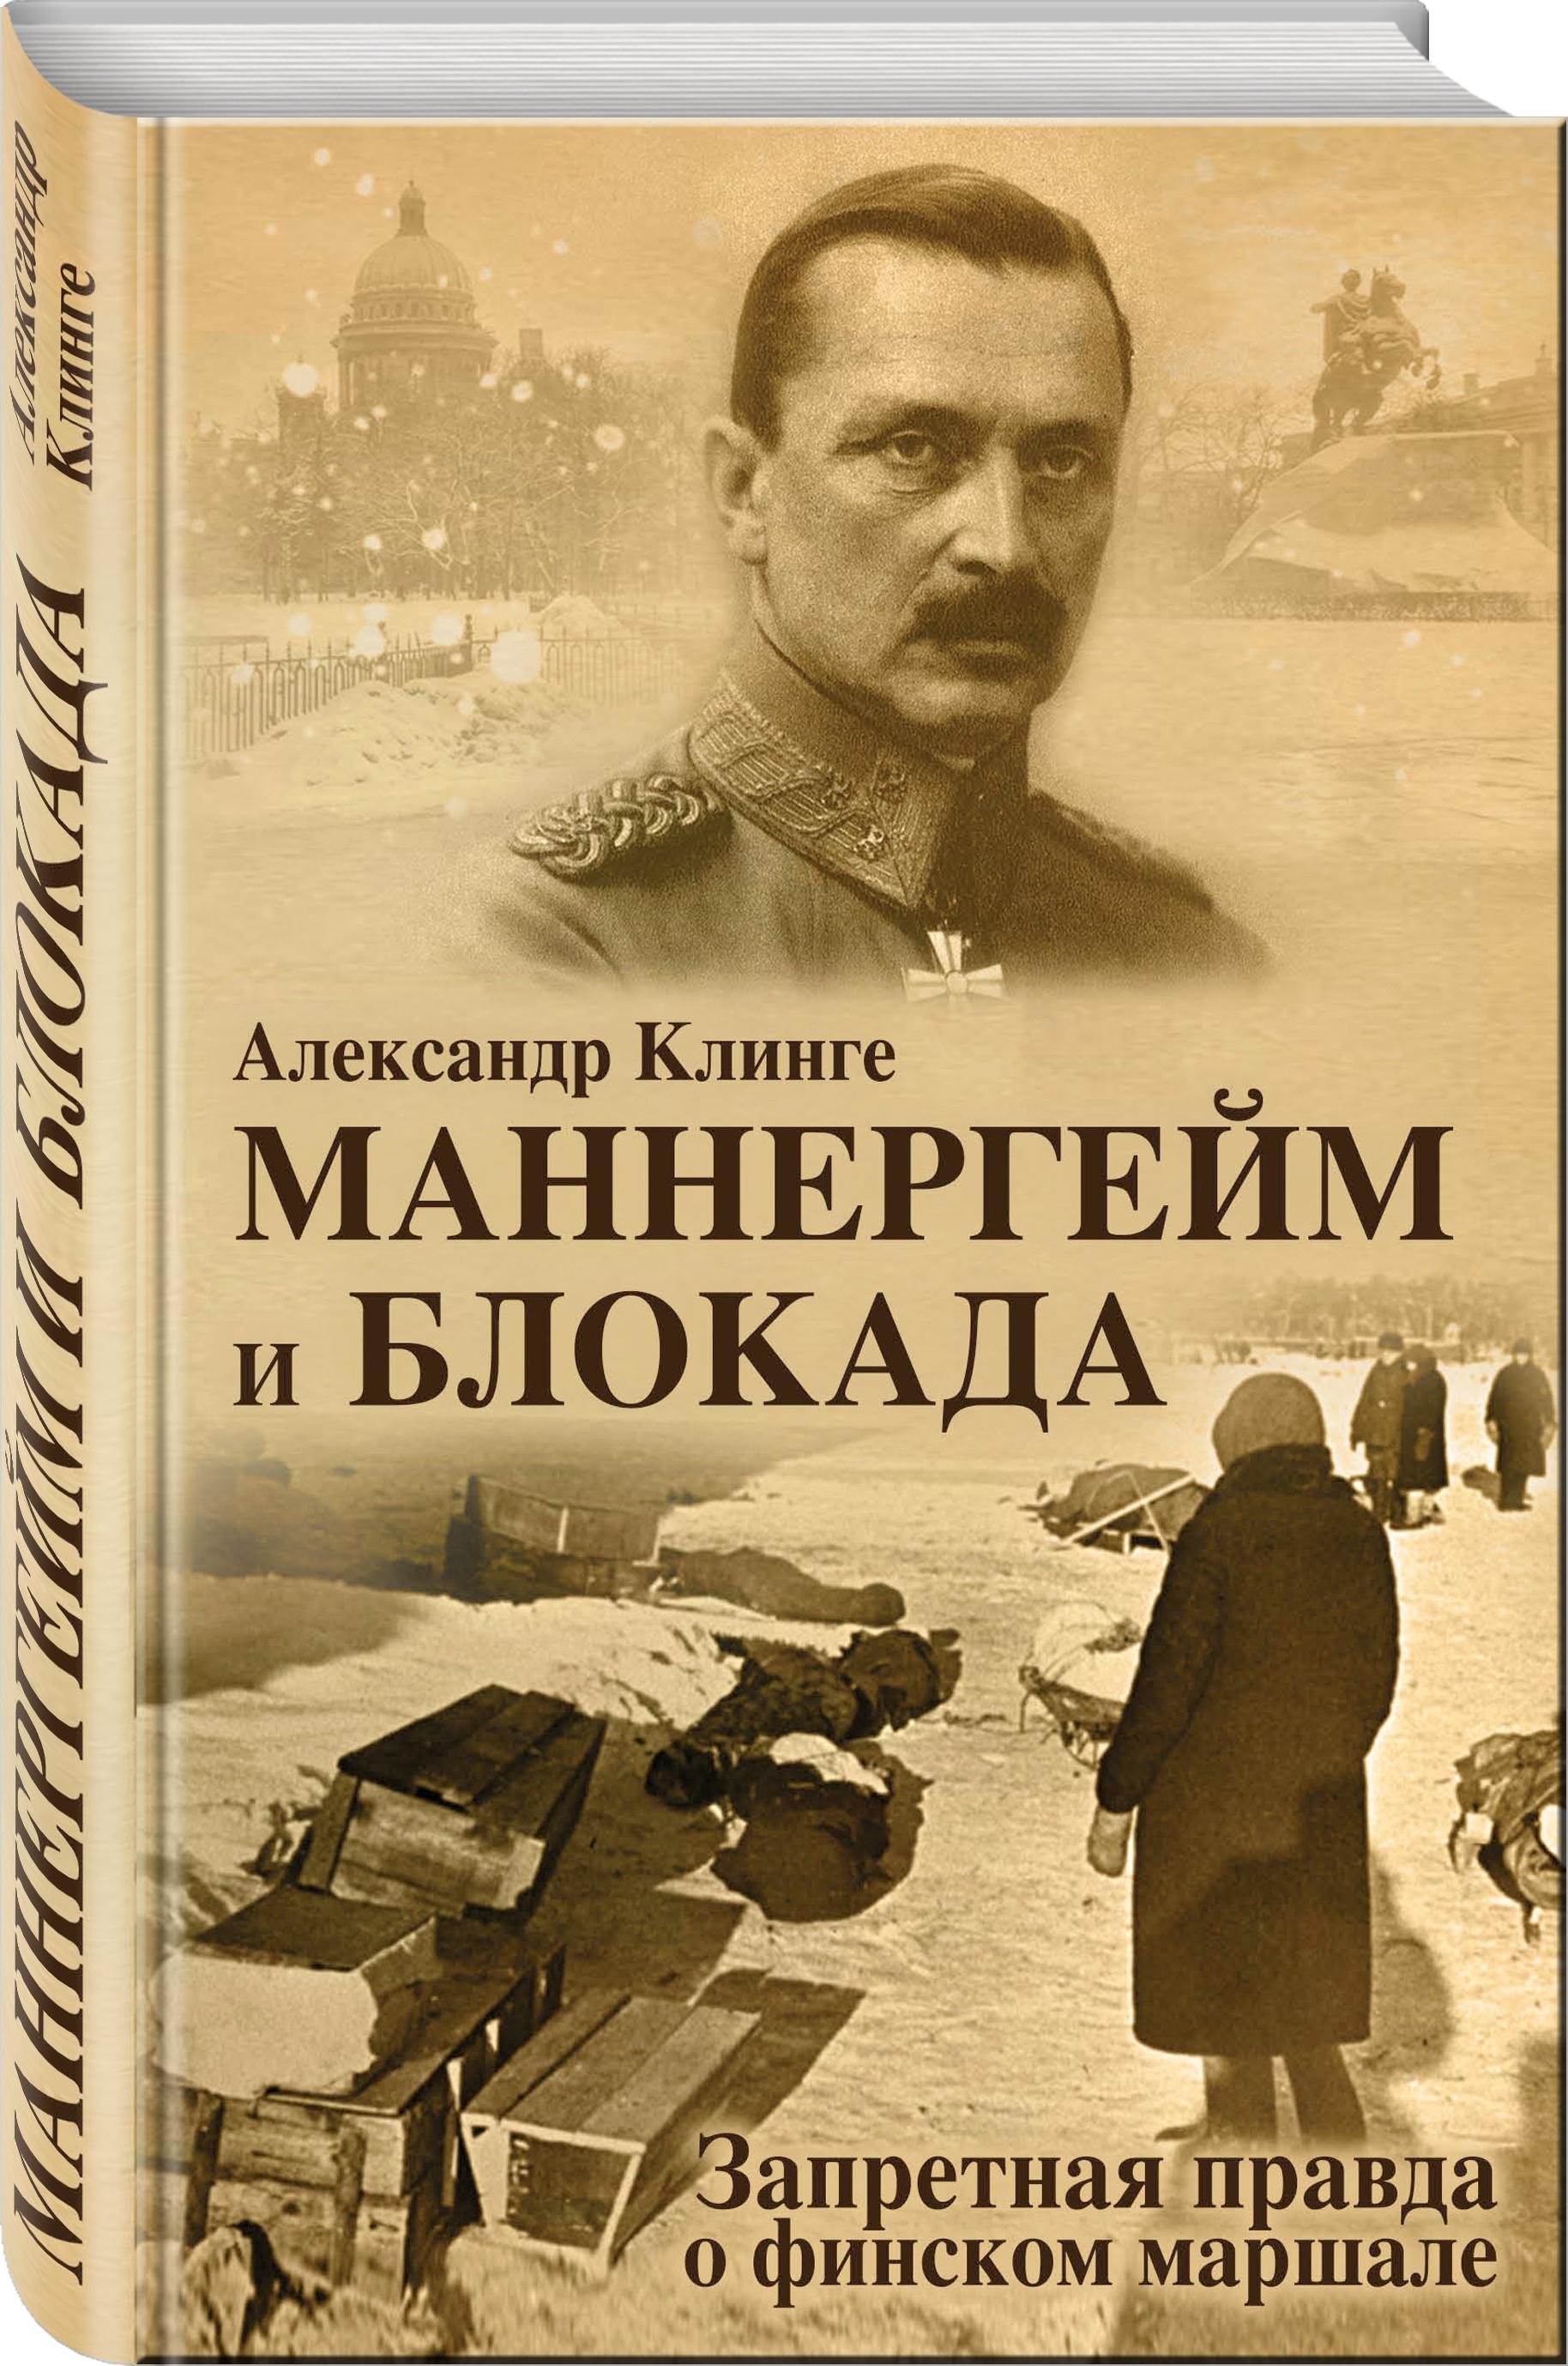 Клинге А. Маннергейм и Блокада: Запретная правда о финском маршале украйна а была ли украина